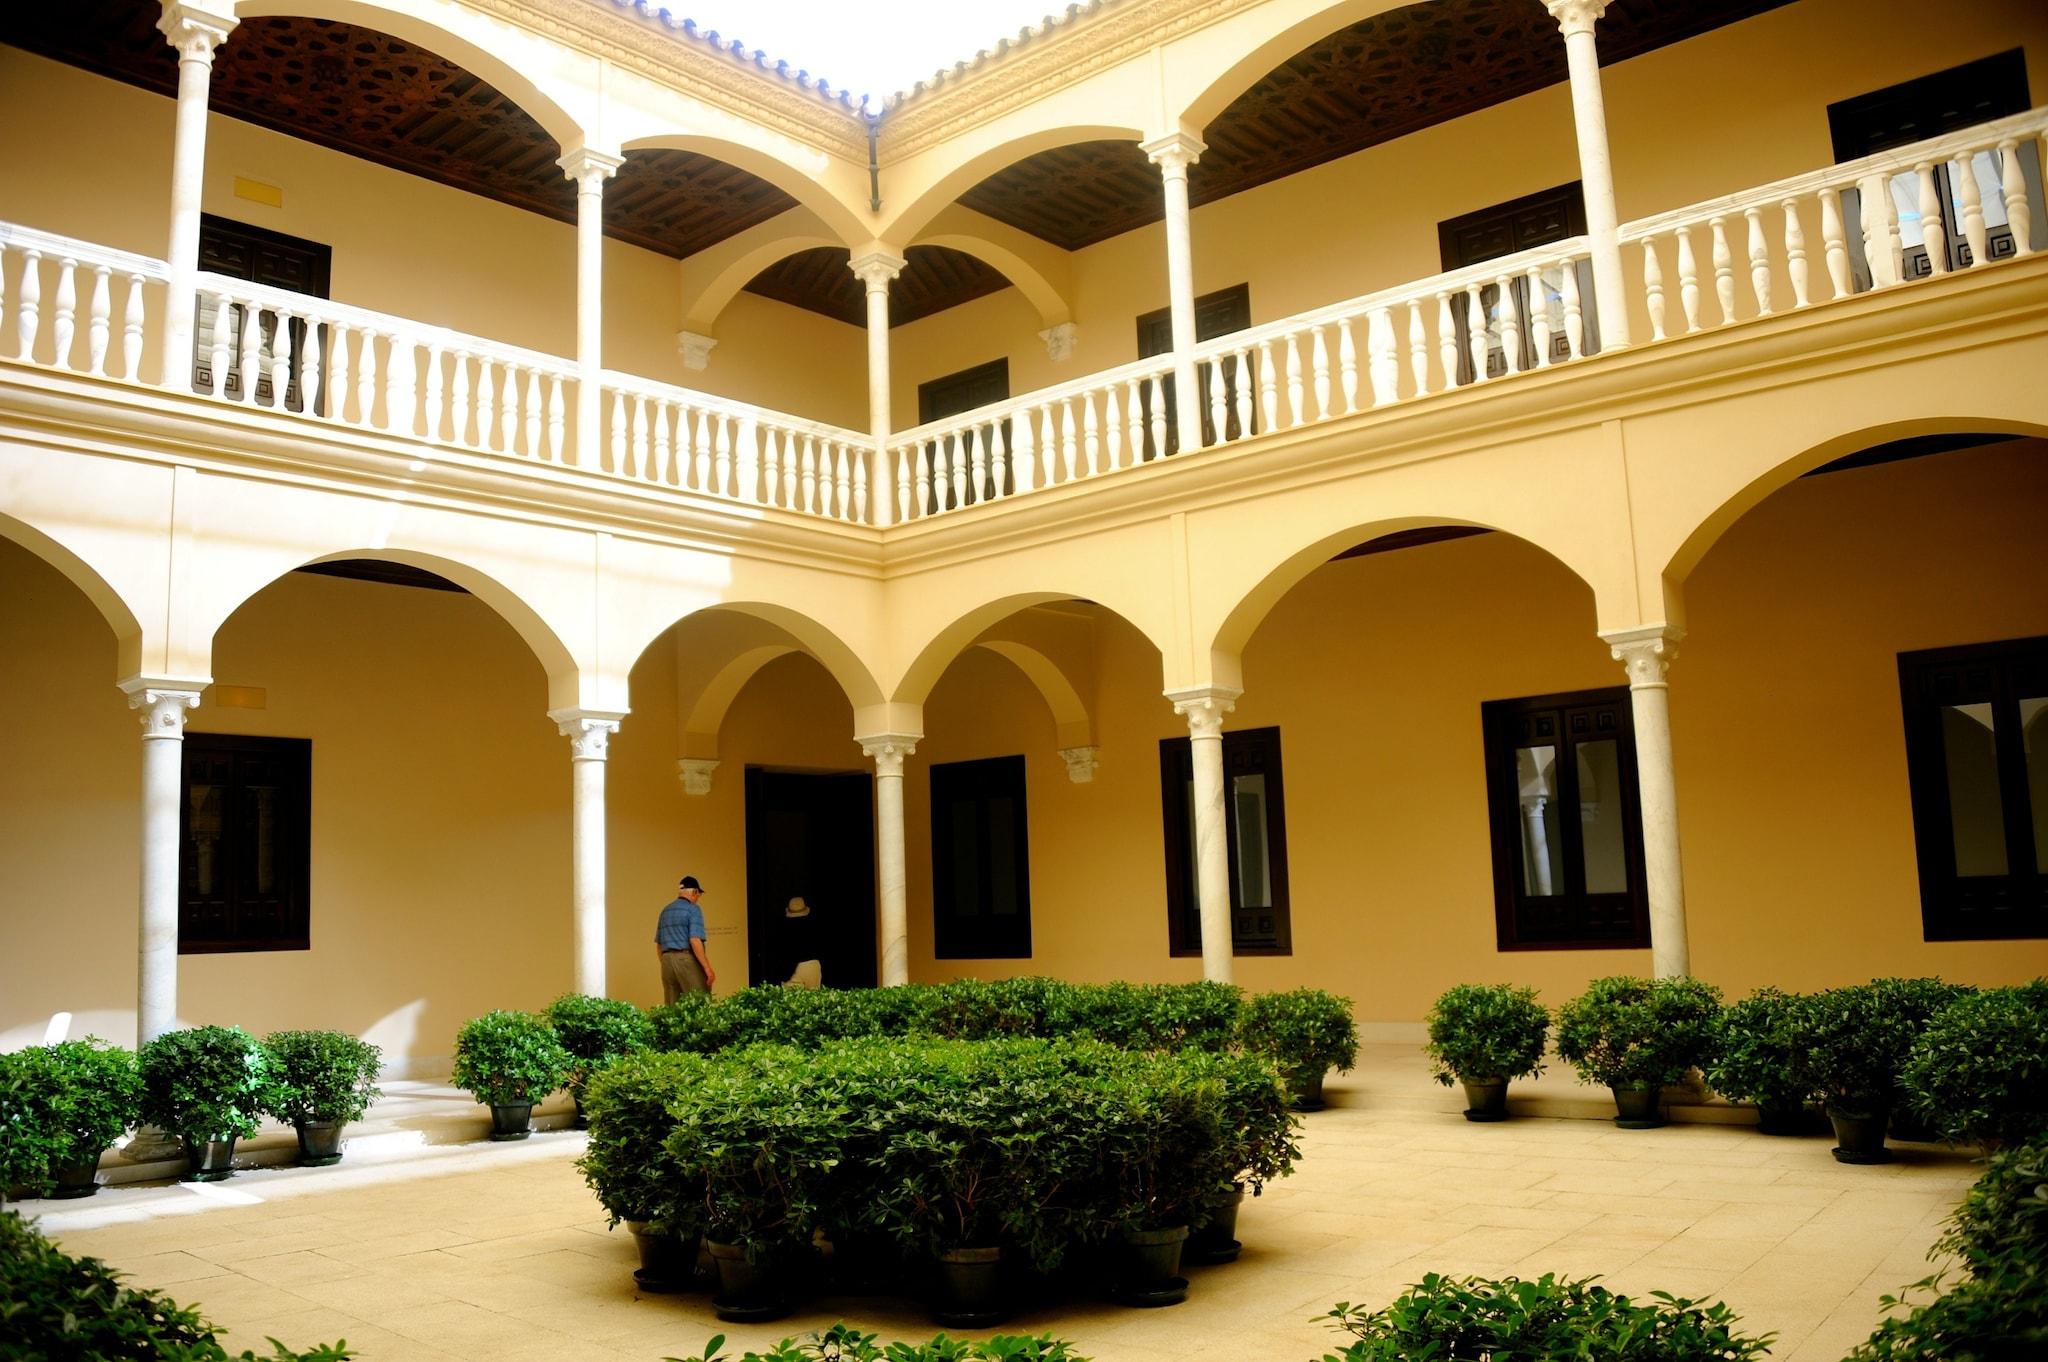 The Picasso Museum in Malaga.